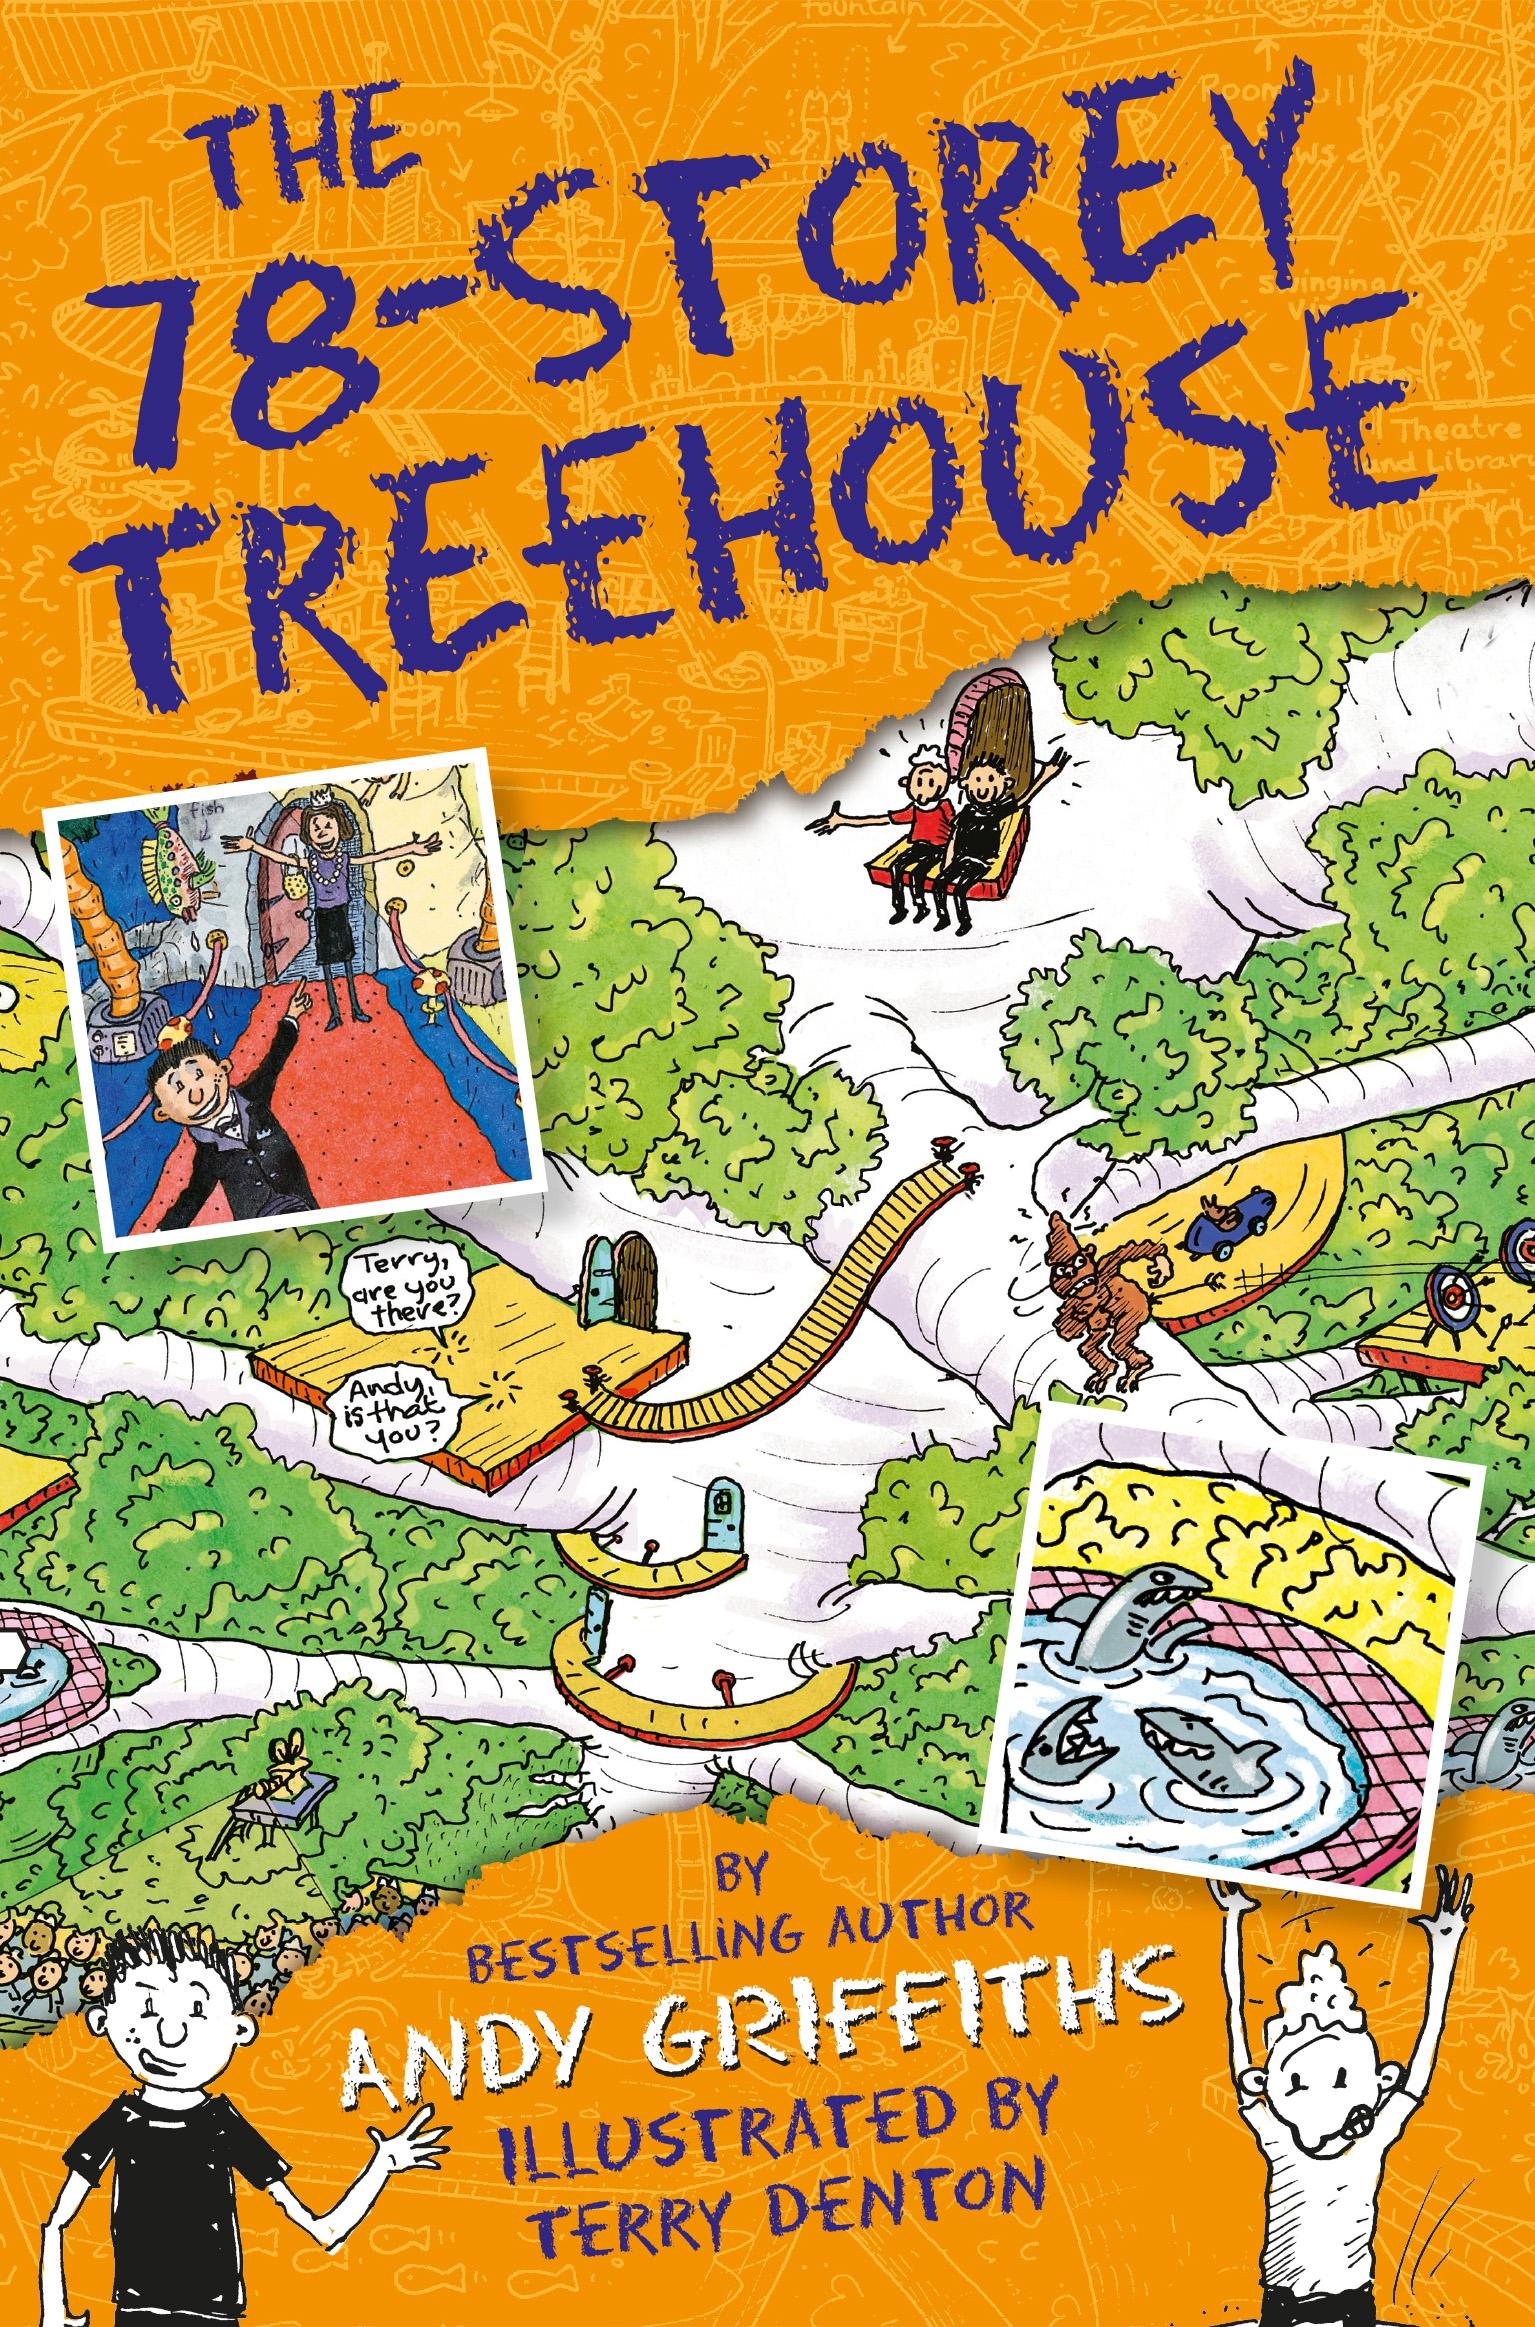 78-STOREY TREEHOUSE, THE